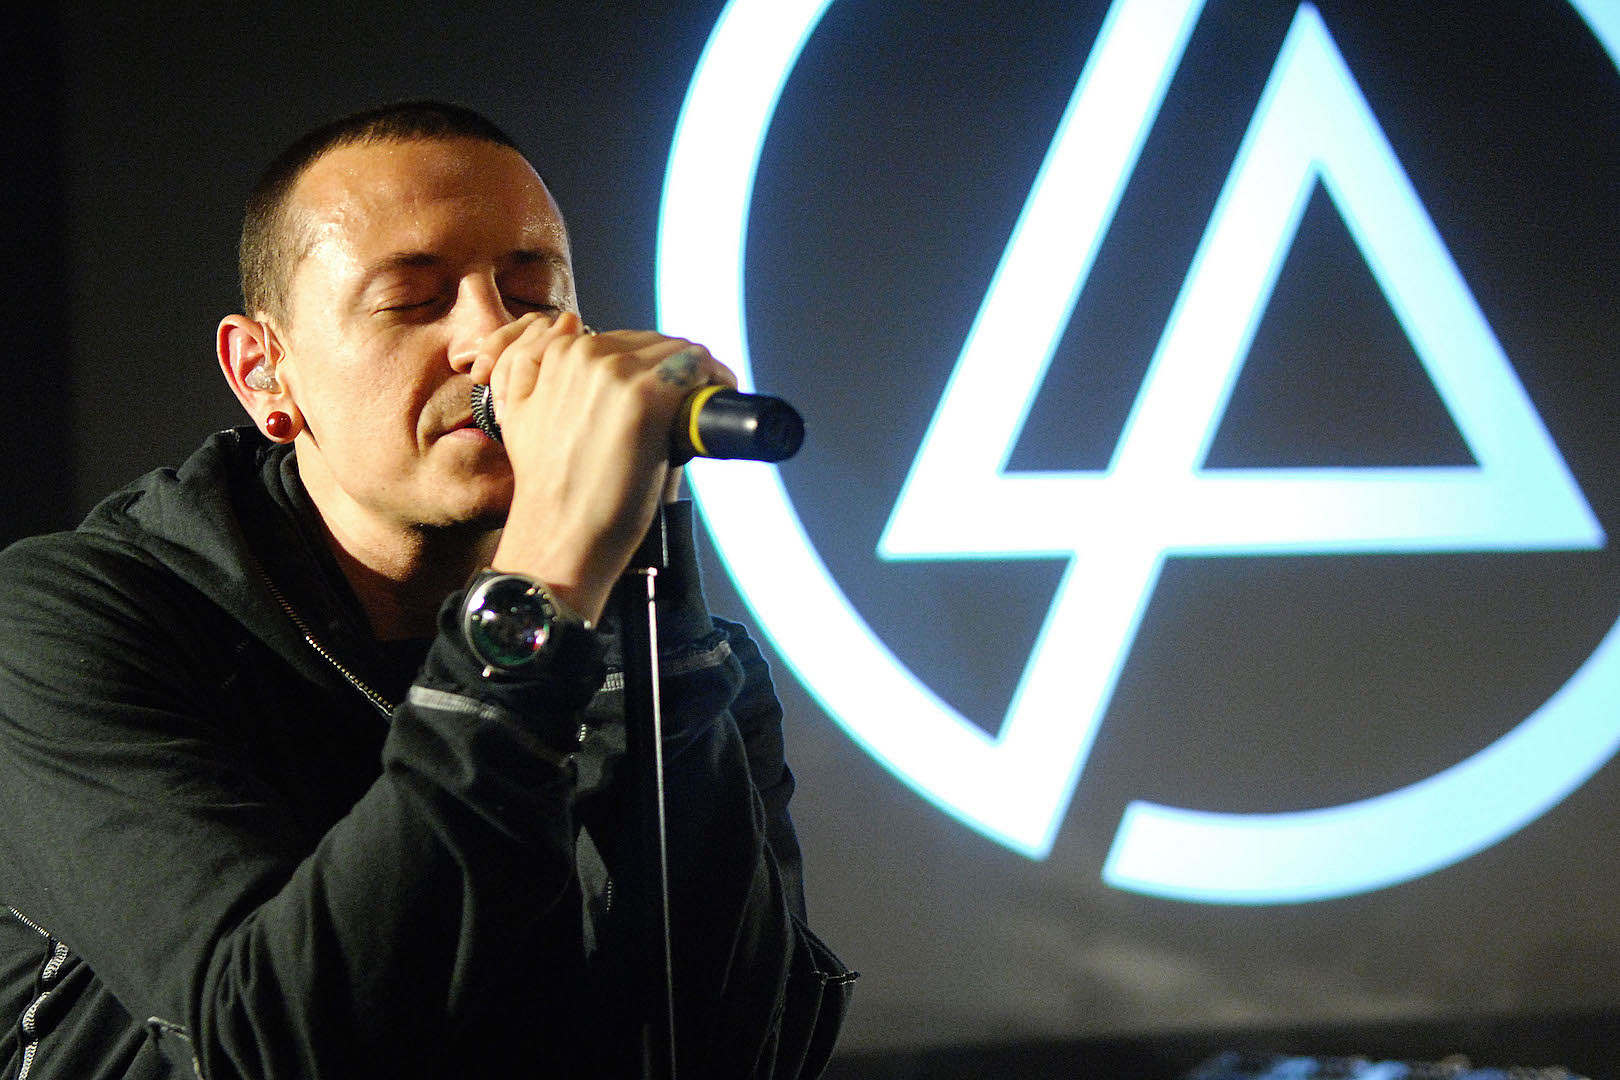 Two Years Ago: Linkin Park's Chester Bennington Dies